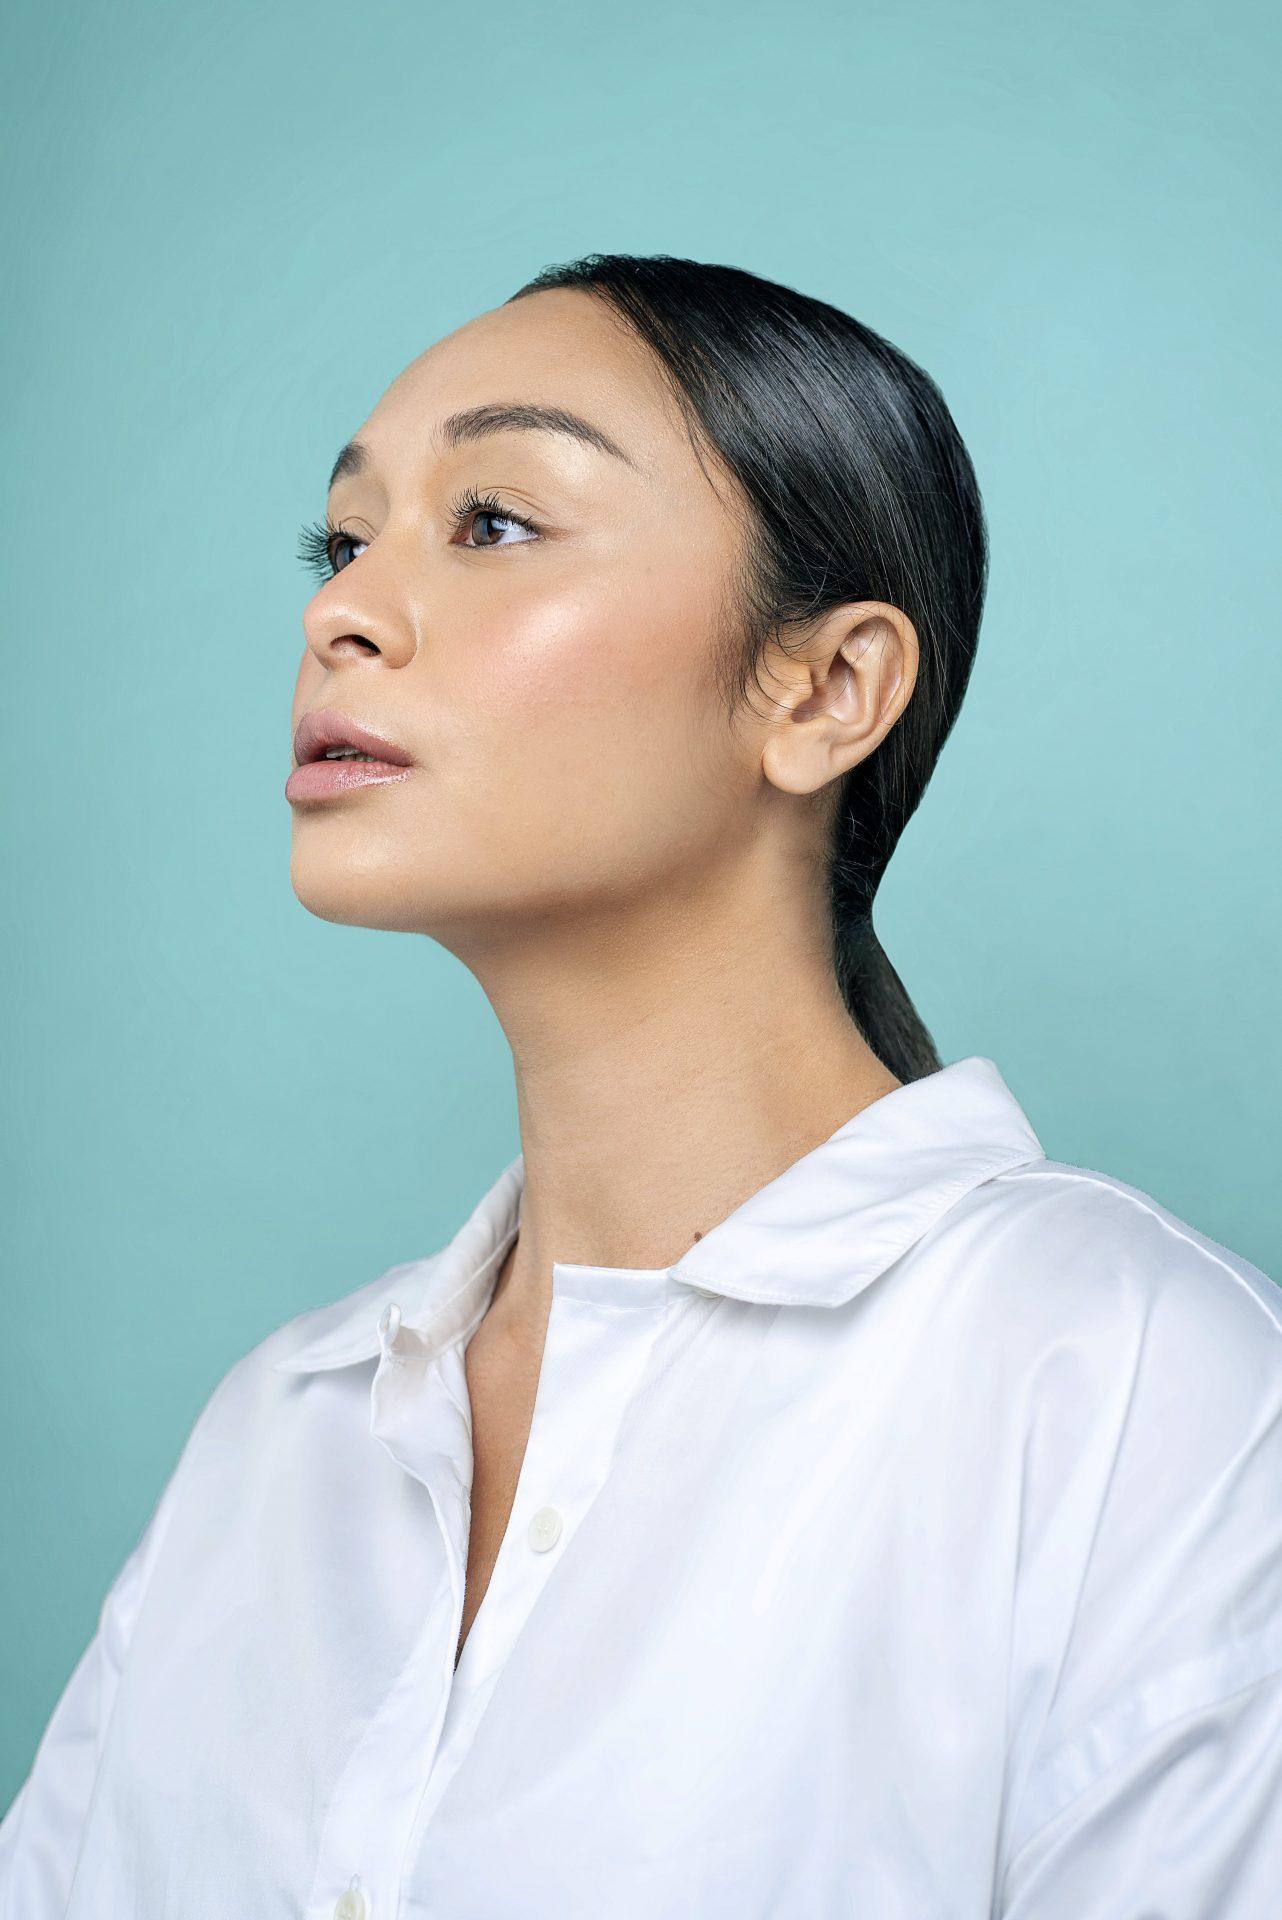 How to nail that no-makeup makeup look